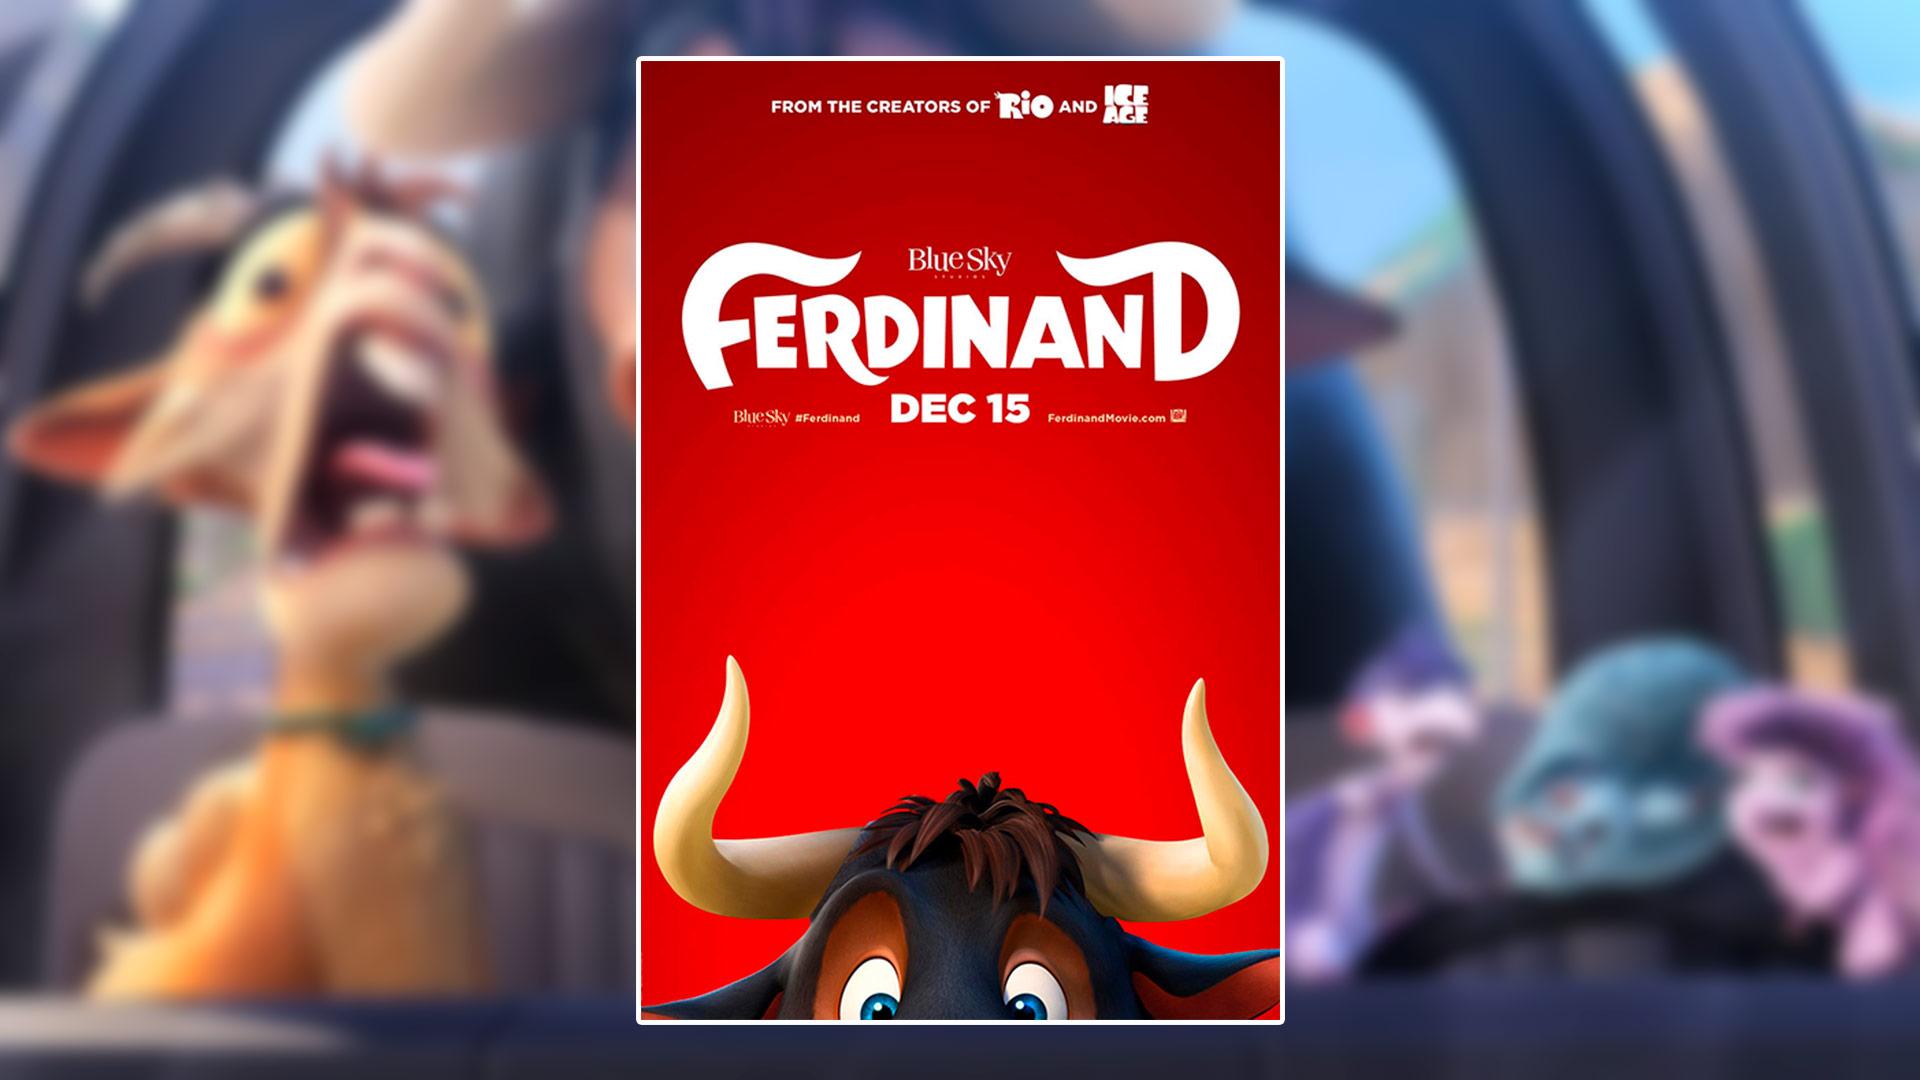 Critique du film Ferdinand avec John Cena